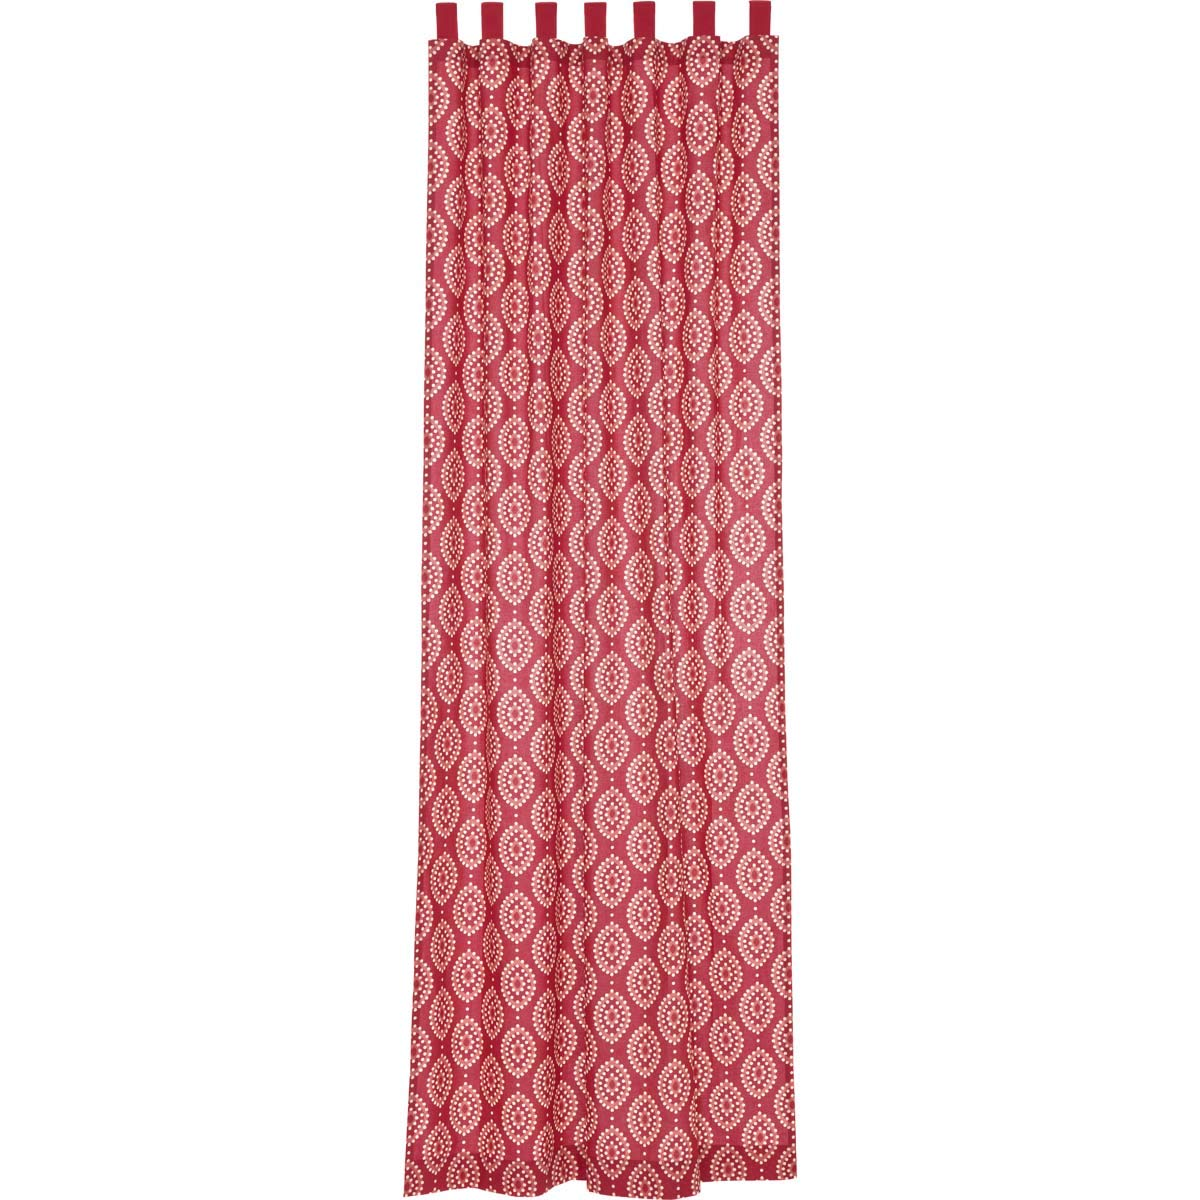 108 x 50 VHC Brands Coastal Window Paloma Red Tab Top Curtain Panel Crimson